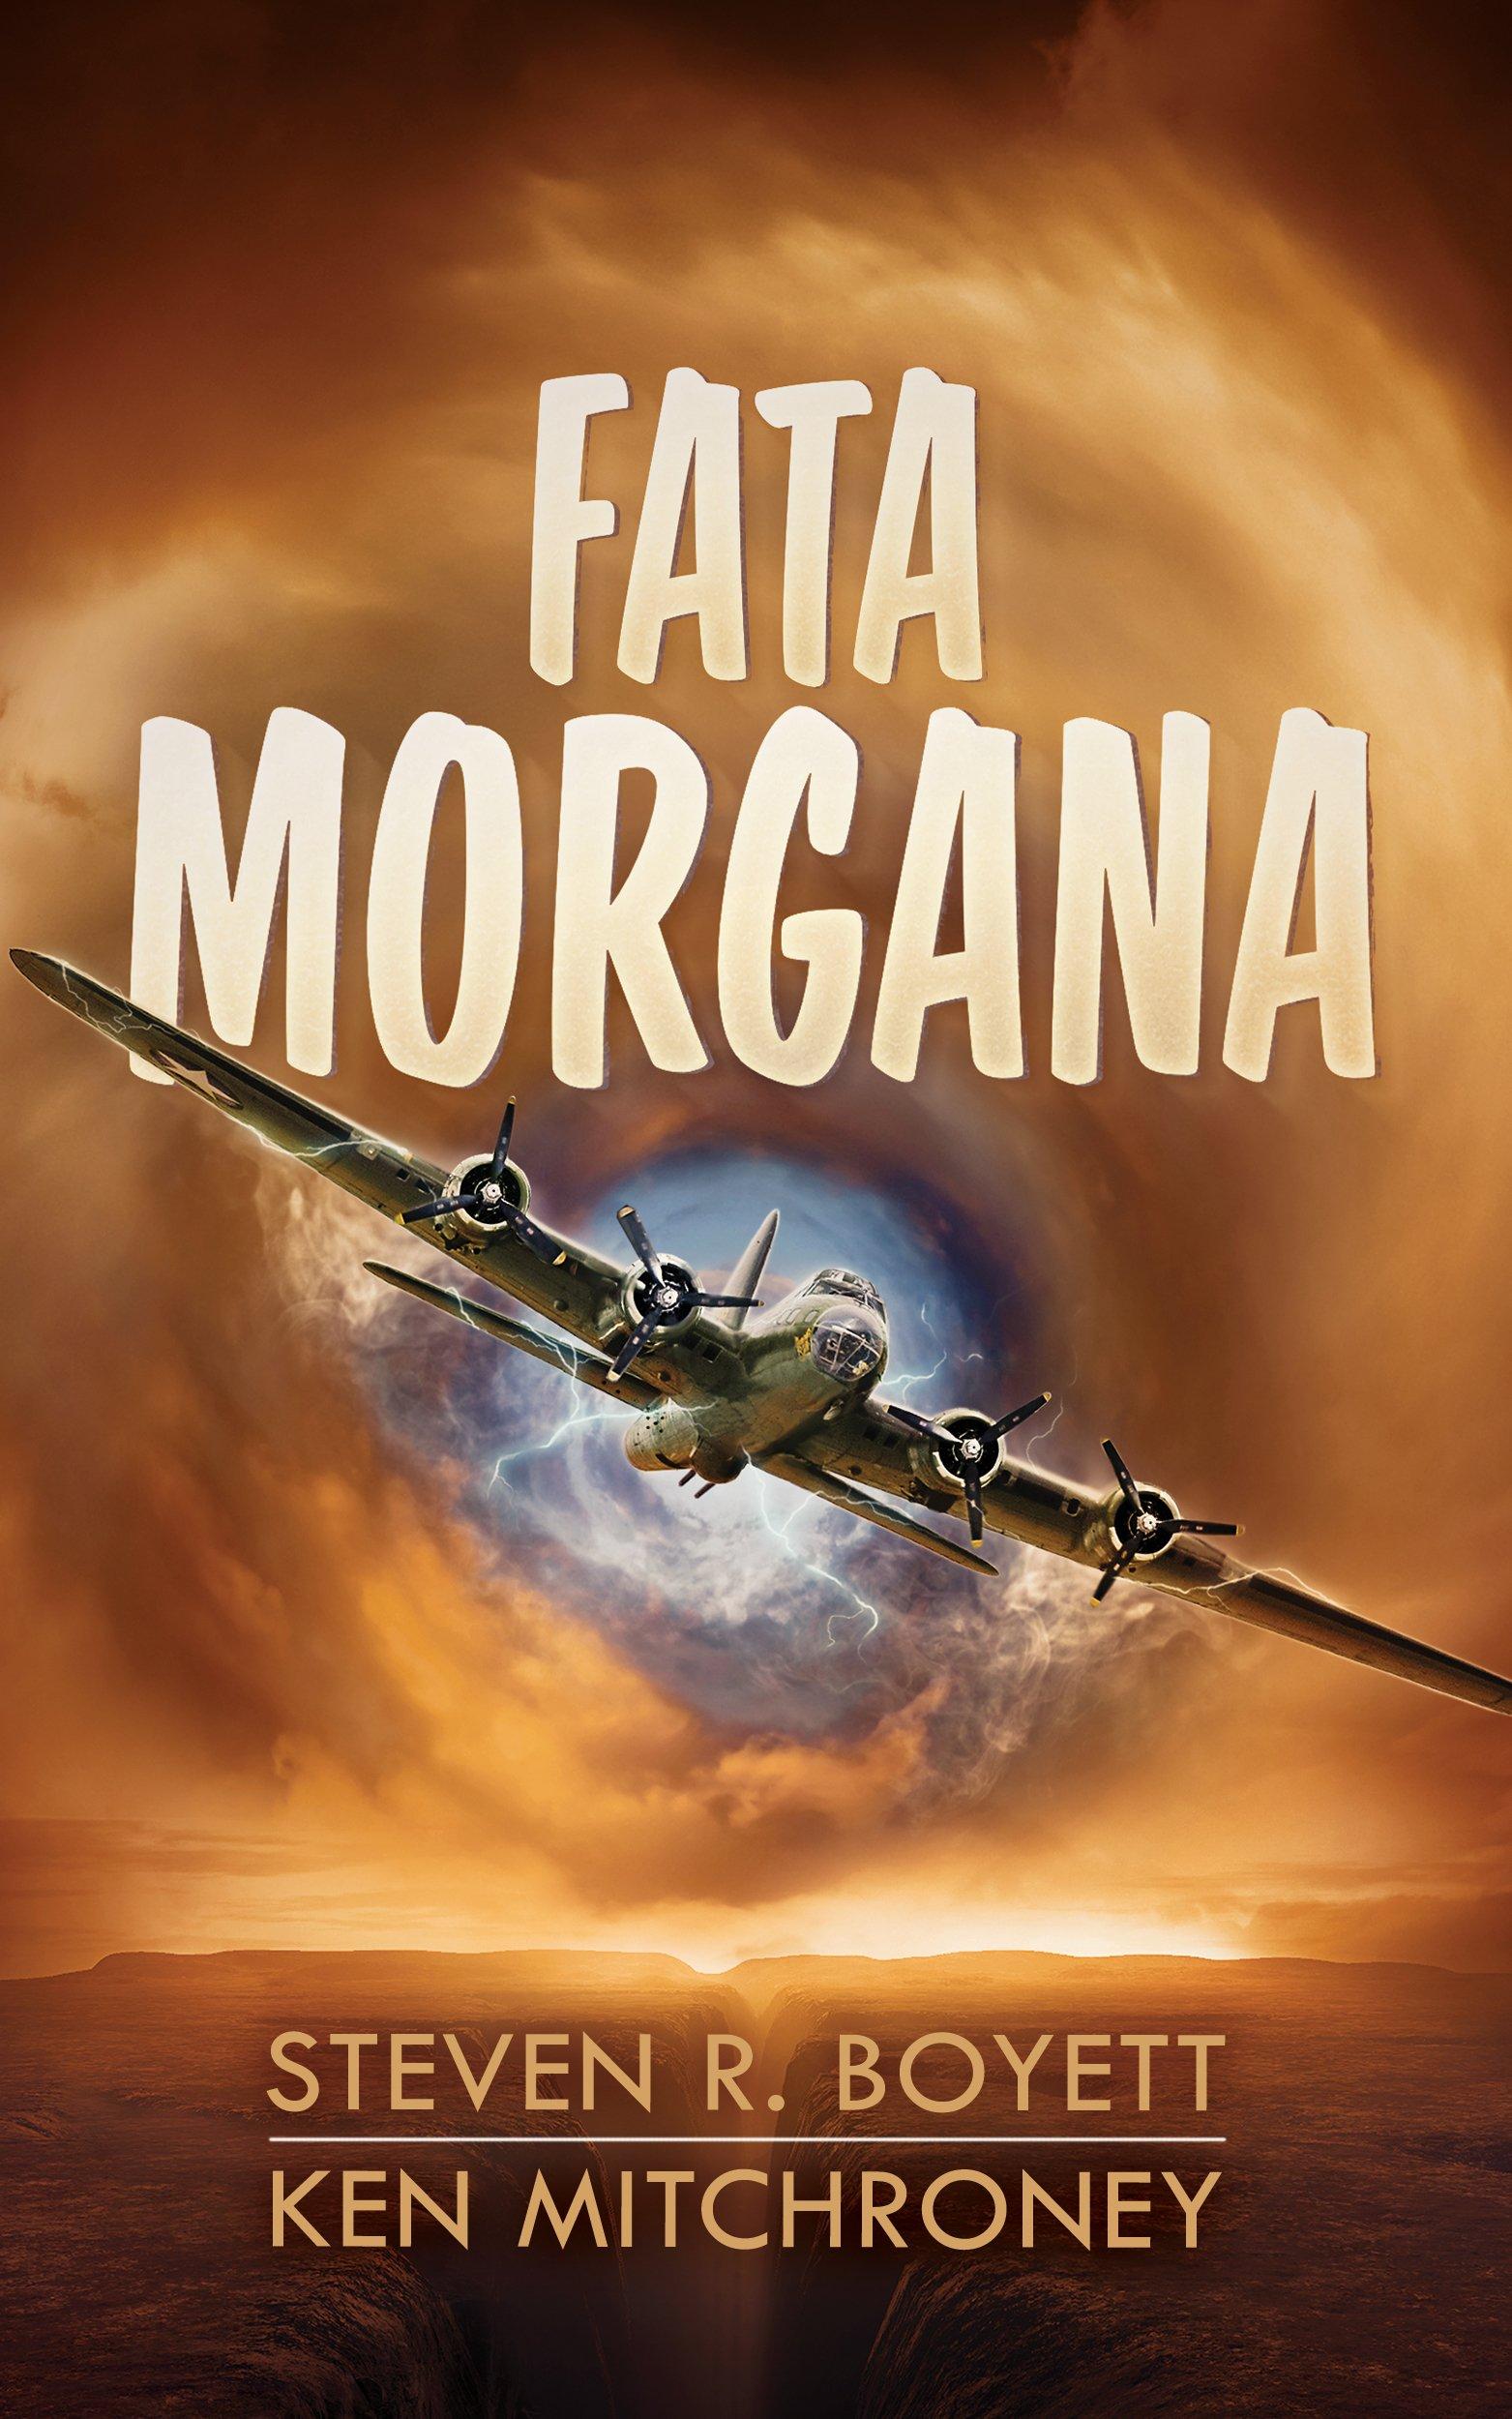 Fata Morgana: Amazon.es: Steven R. Boyett, Ken Mitchroney ...